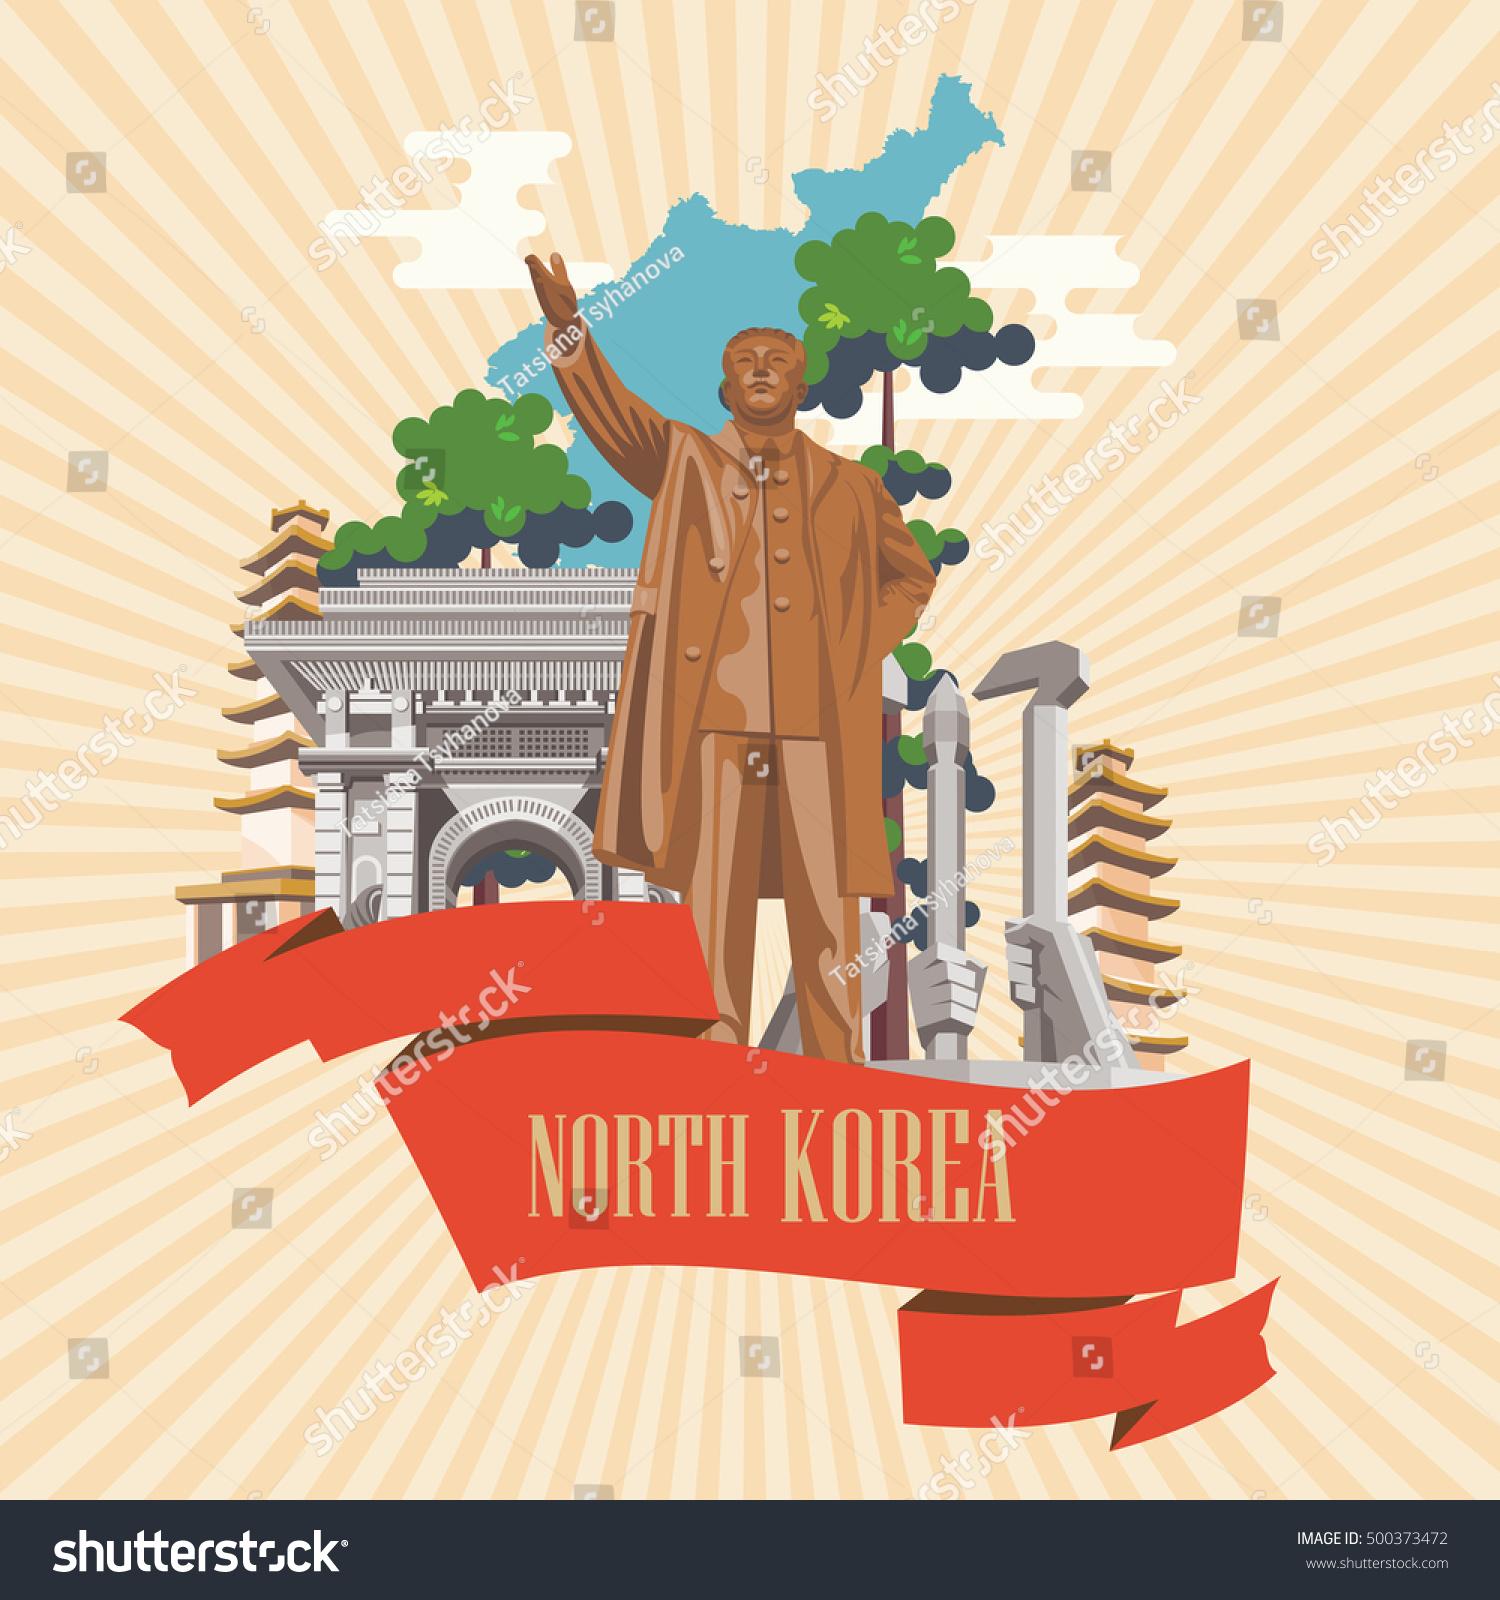 north korea poster statue korean leader stock vector royalty free 500373472 https www shutterstock com image vector north korea poster statue korean leader 500373472